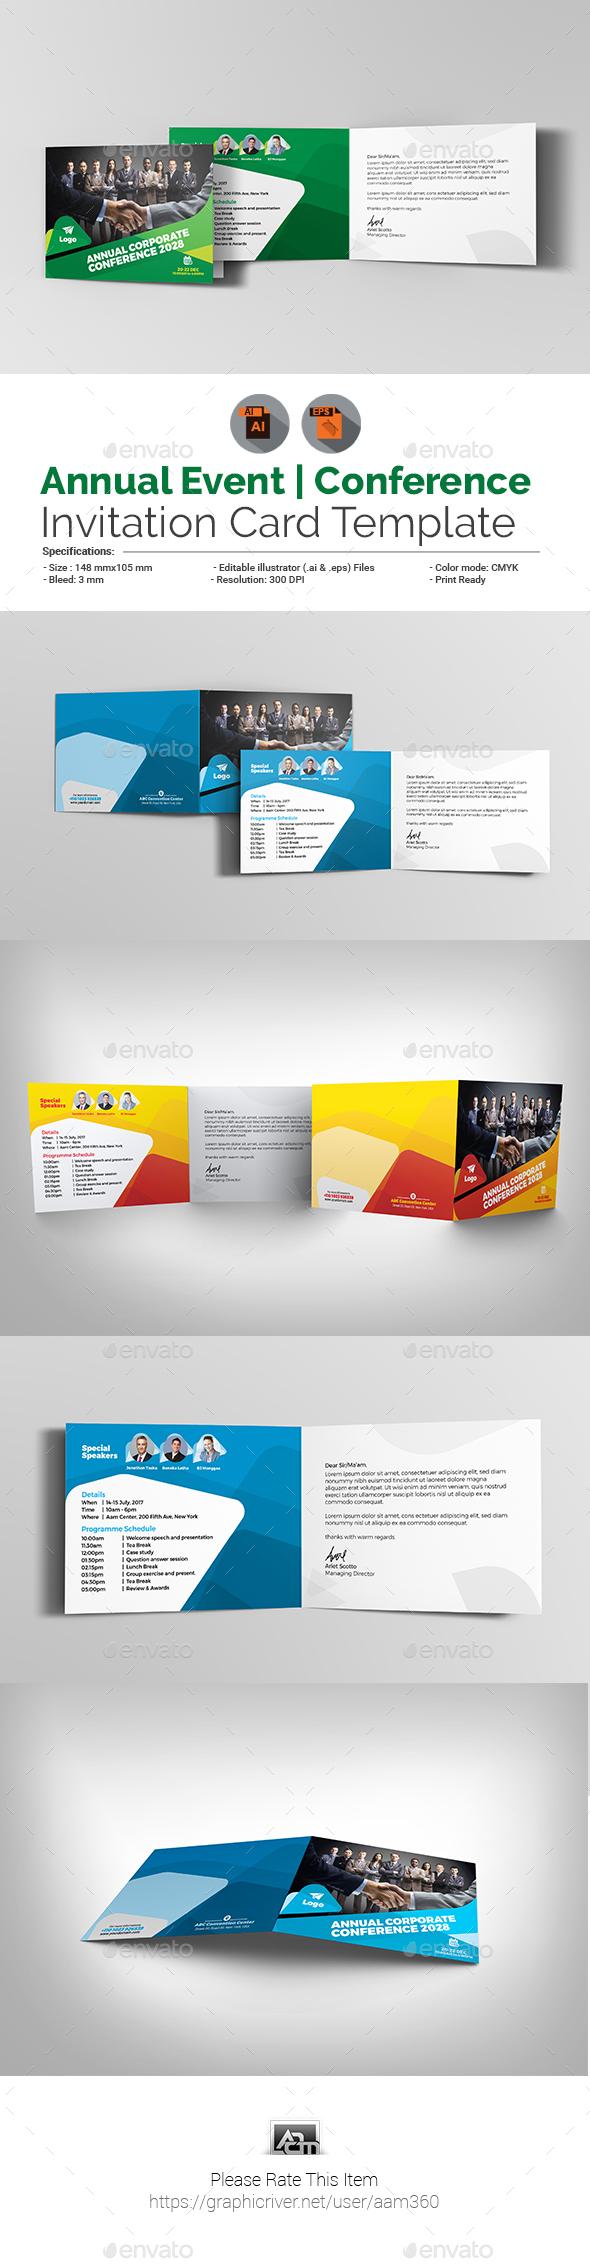 Annual Corporate Event/Conference Invitation Card - Cards & Invites Print Templates